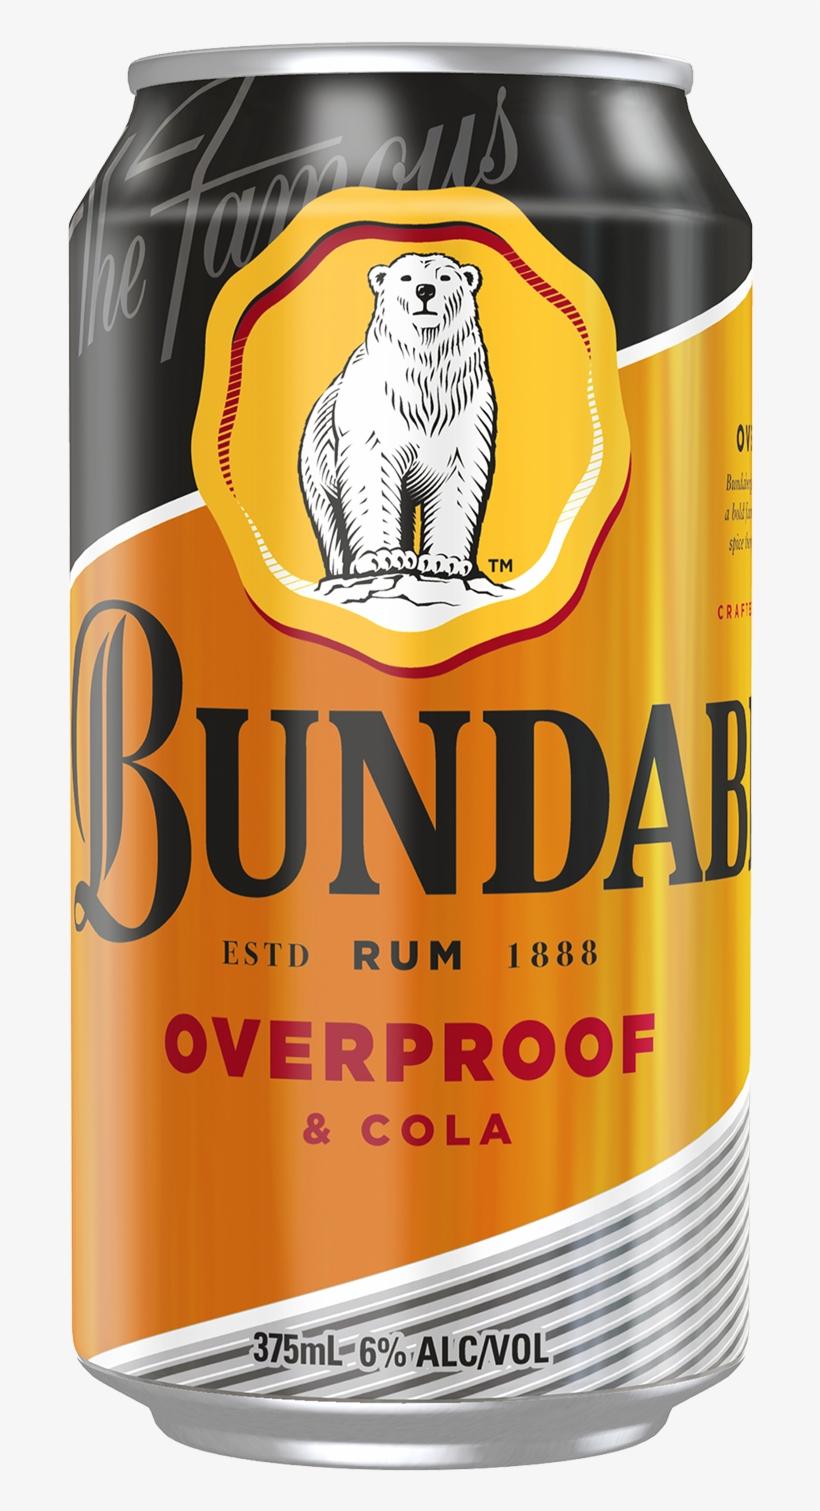 Bundaberg Op Rum & Cola Cans 375ml - Bundaberg Up Rum & Cola Cans 10 Pack, transparent png #2595396